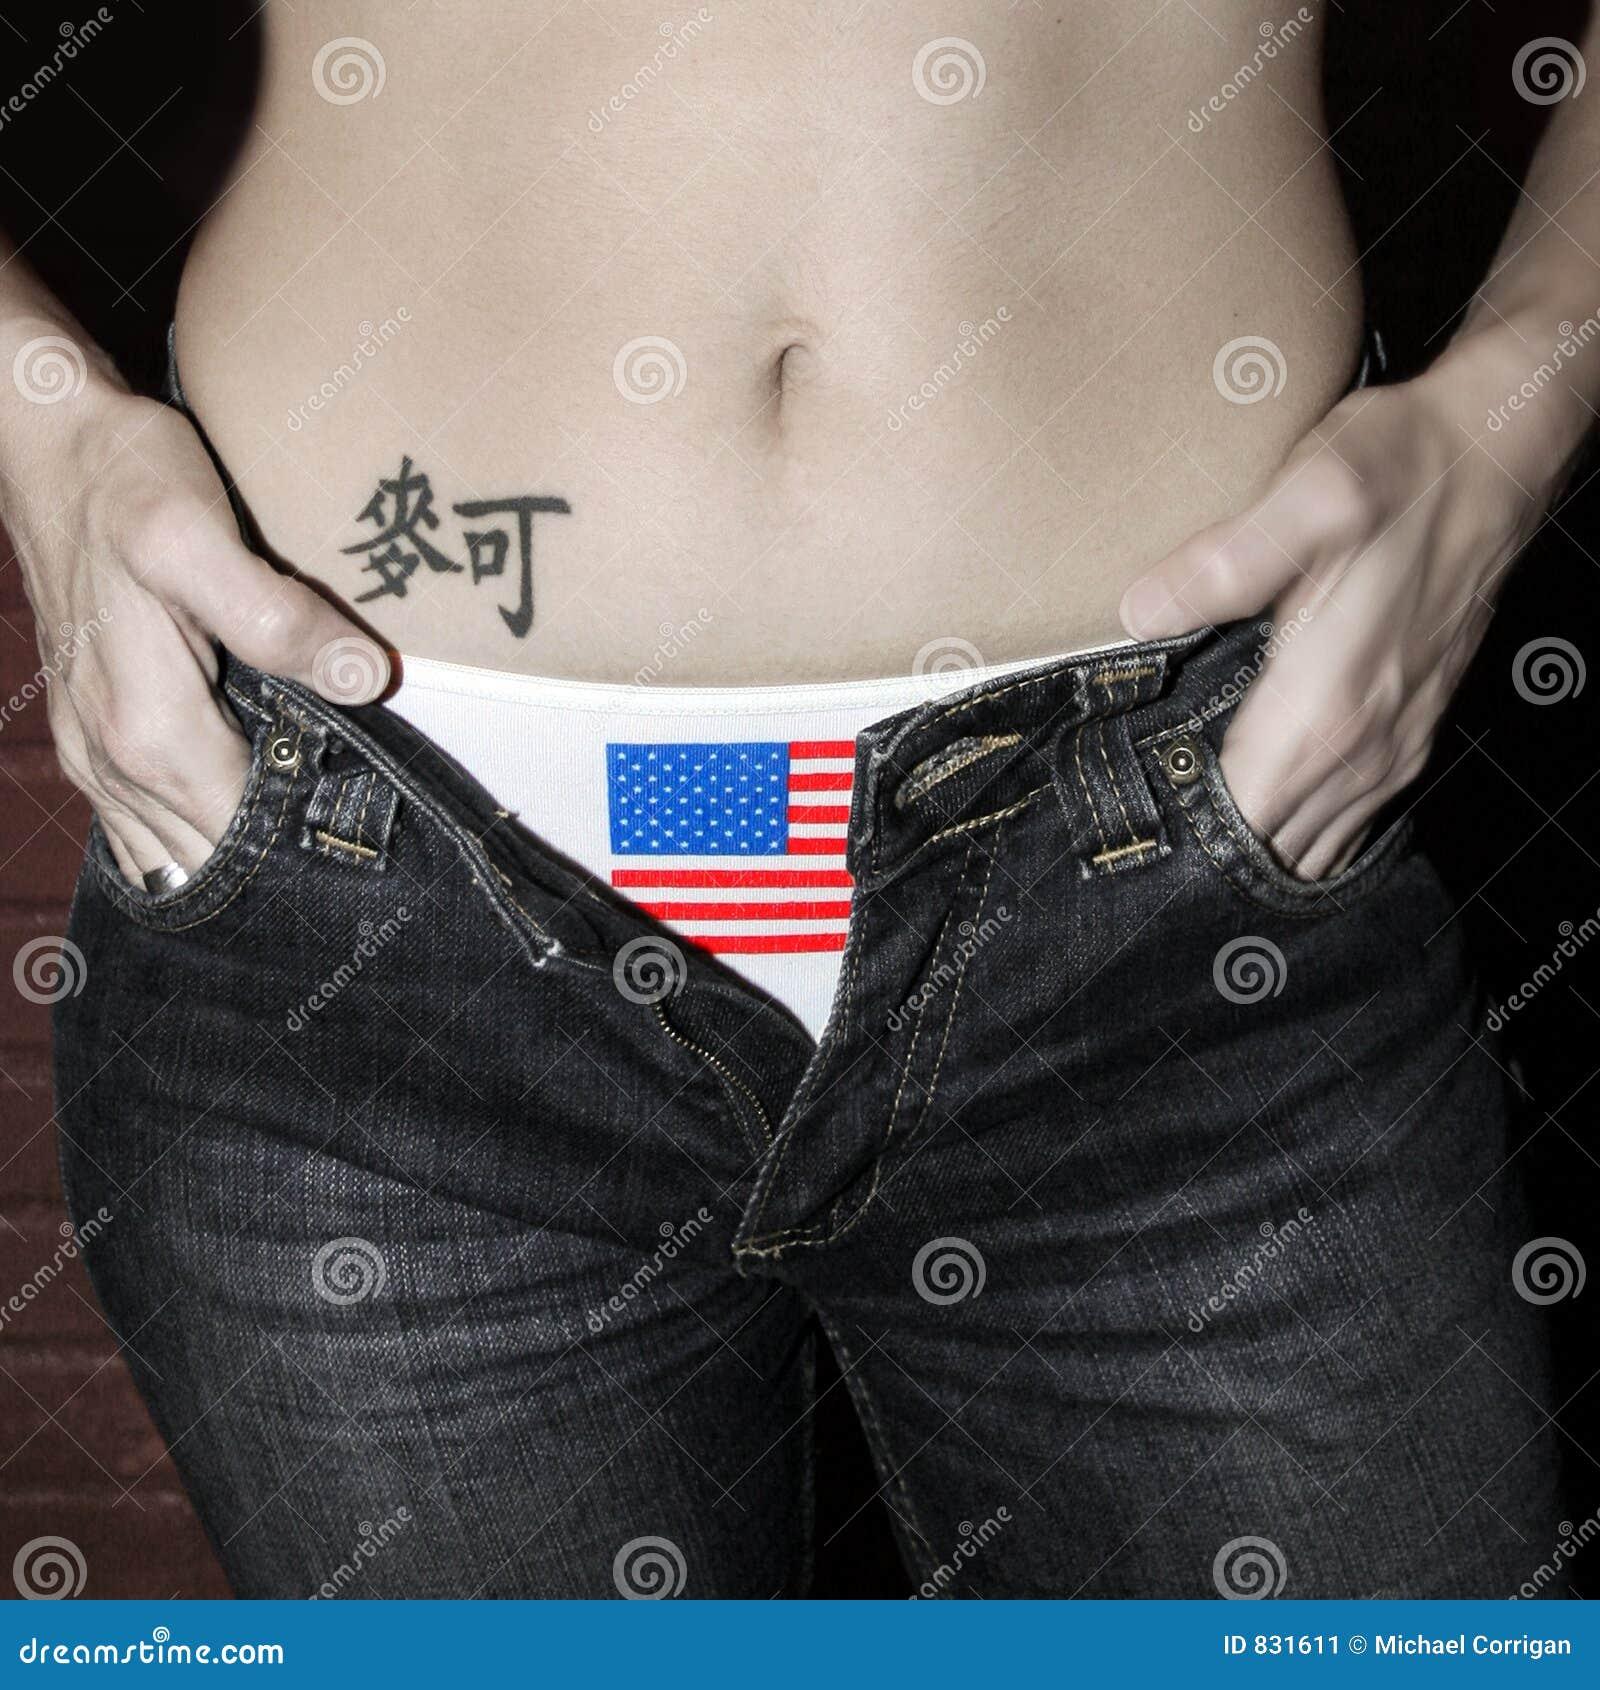 Patriotic Panties